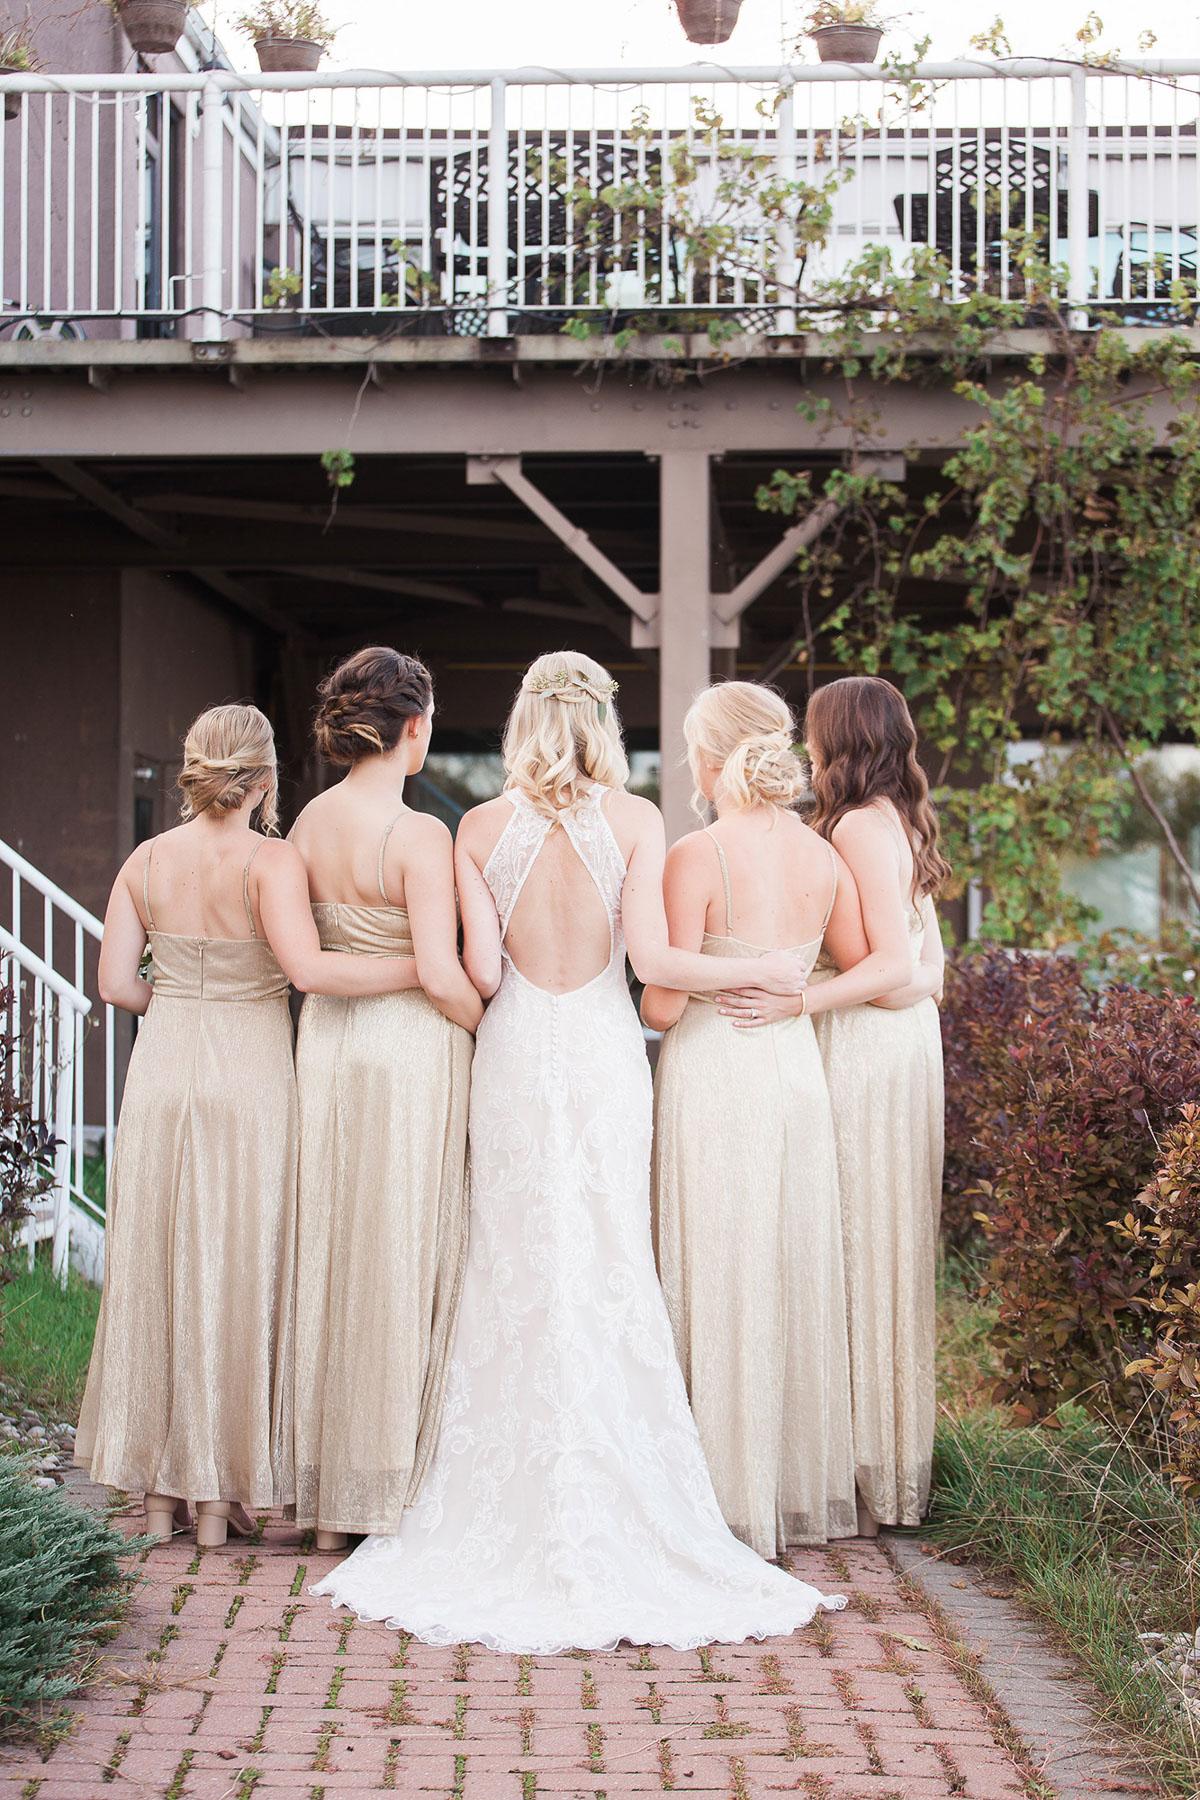 gemini-photography-vineyard-bride-swish-list-honsberger-estates-jordan-wedding-23.jpg